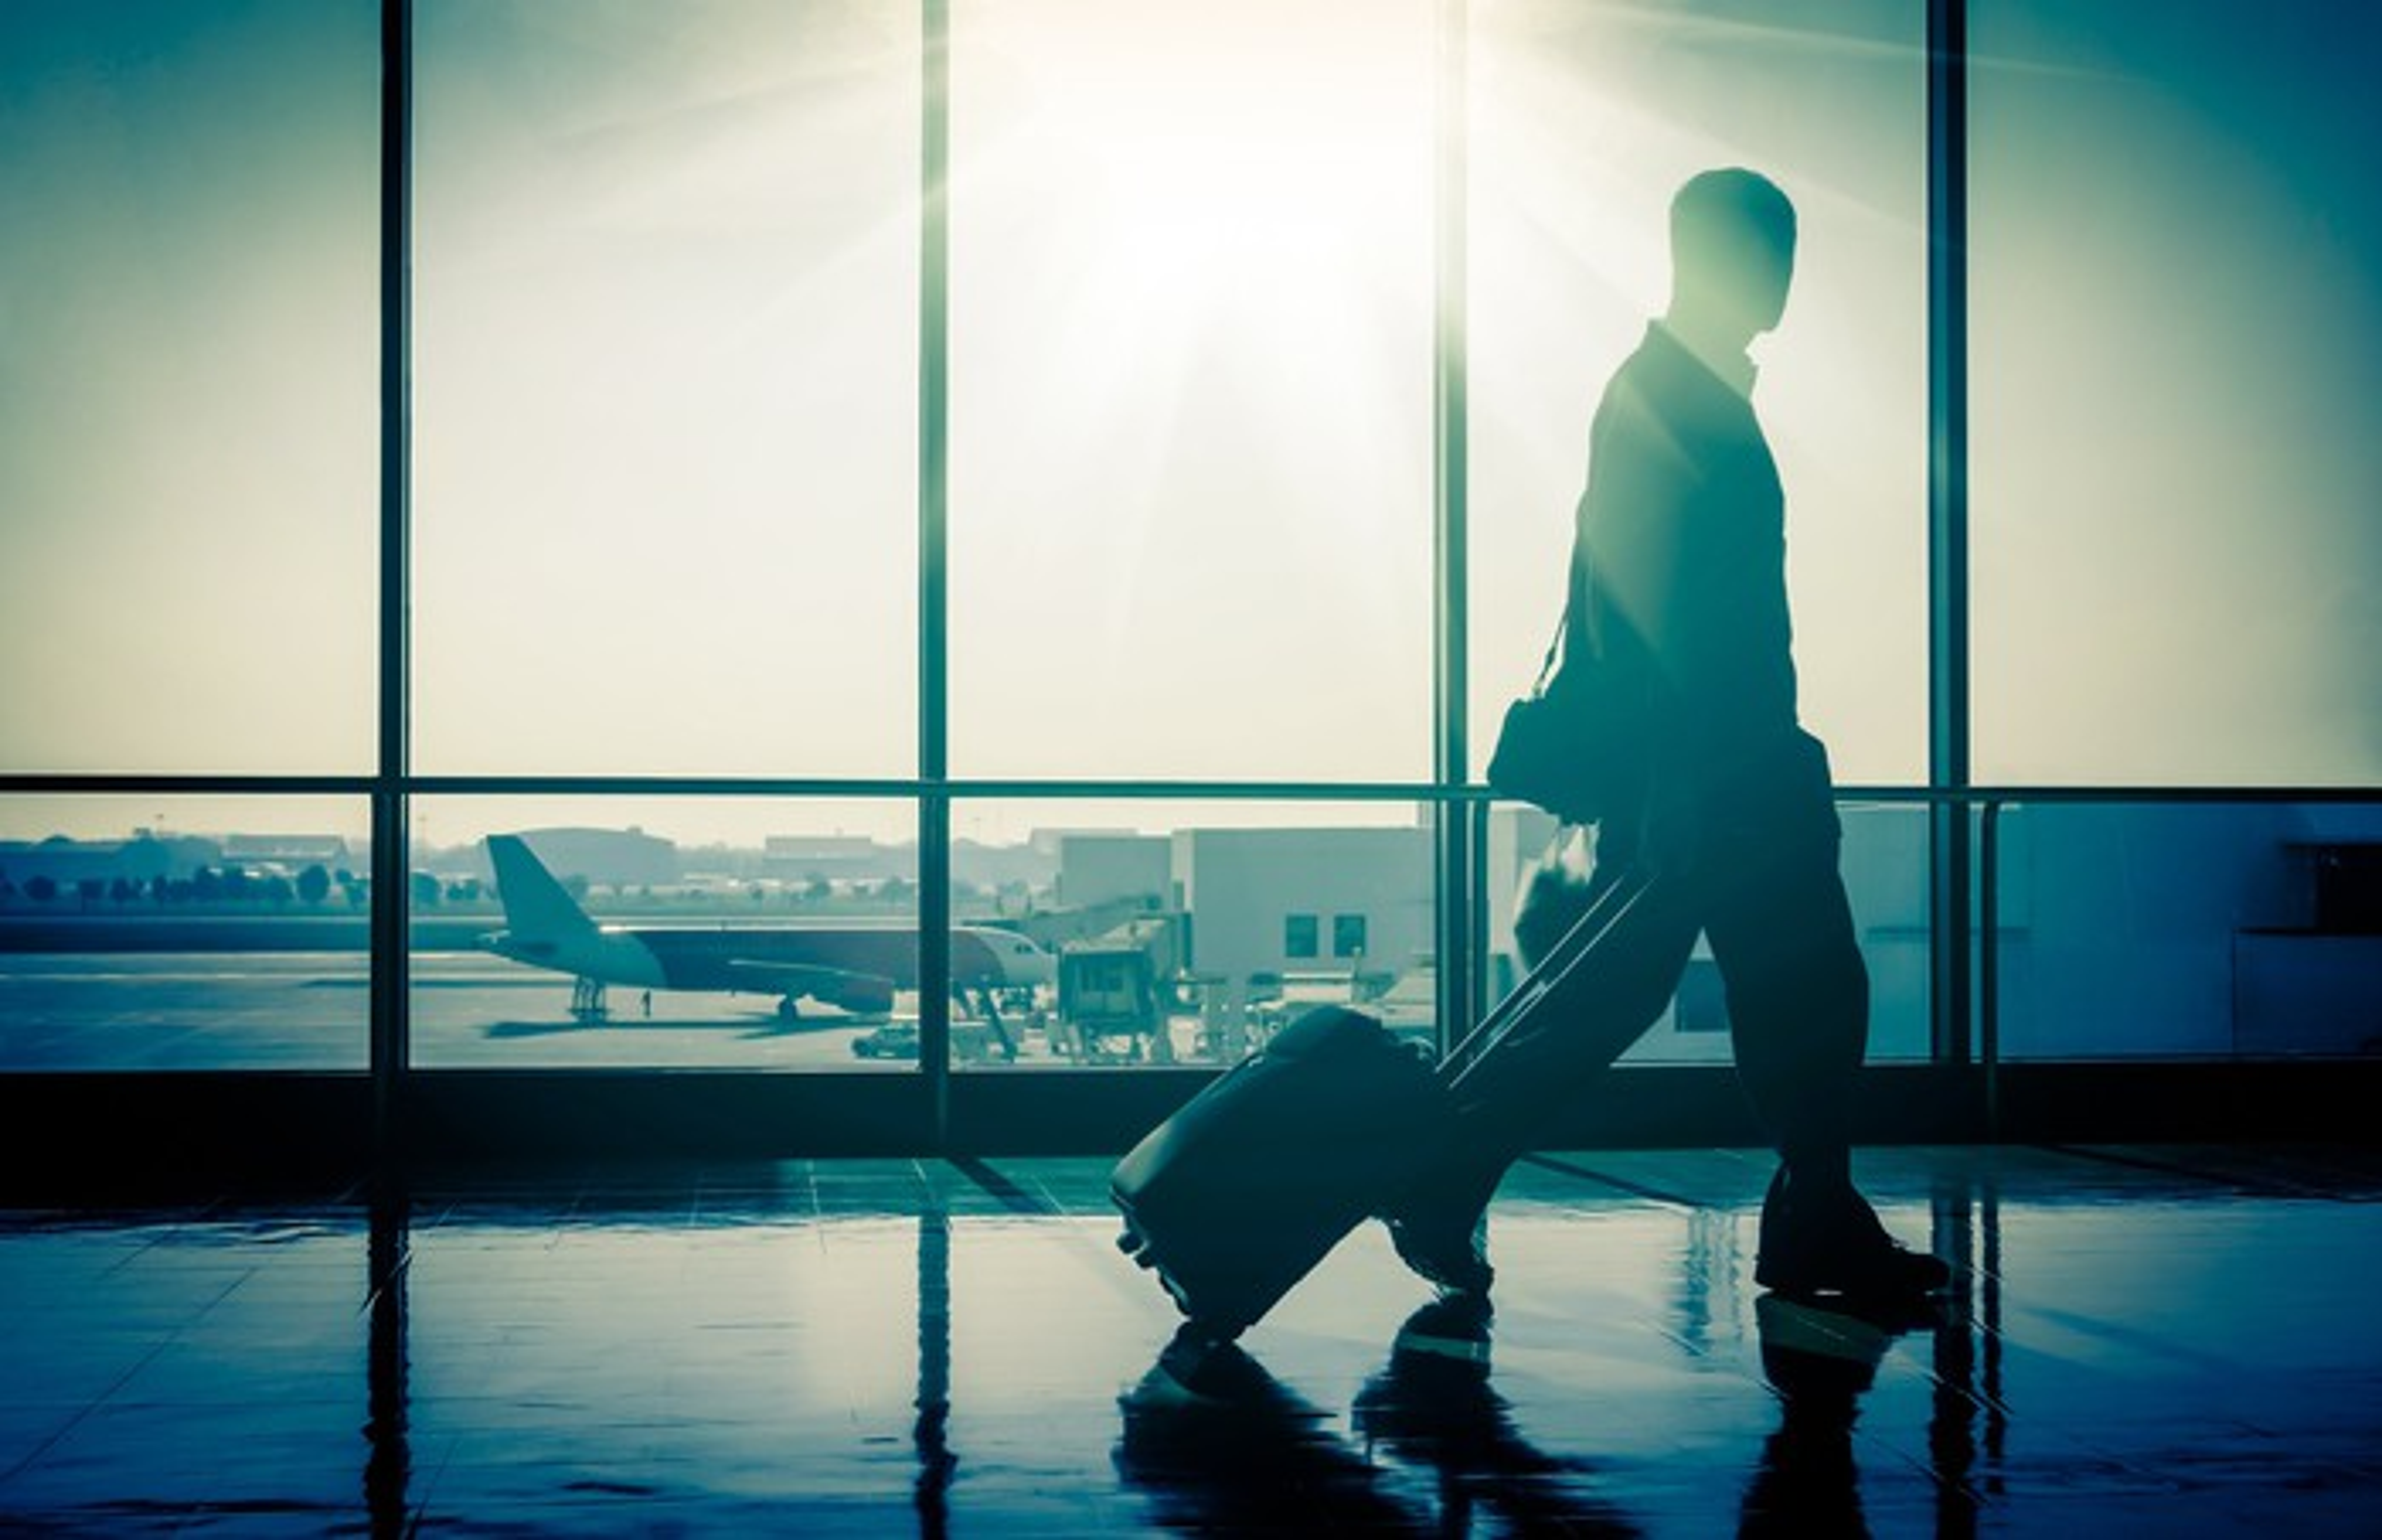 Man rolling suitcase through airport